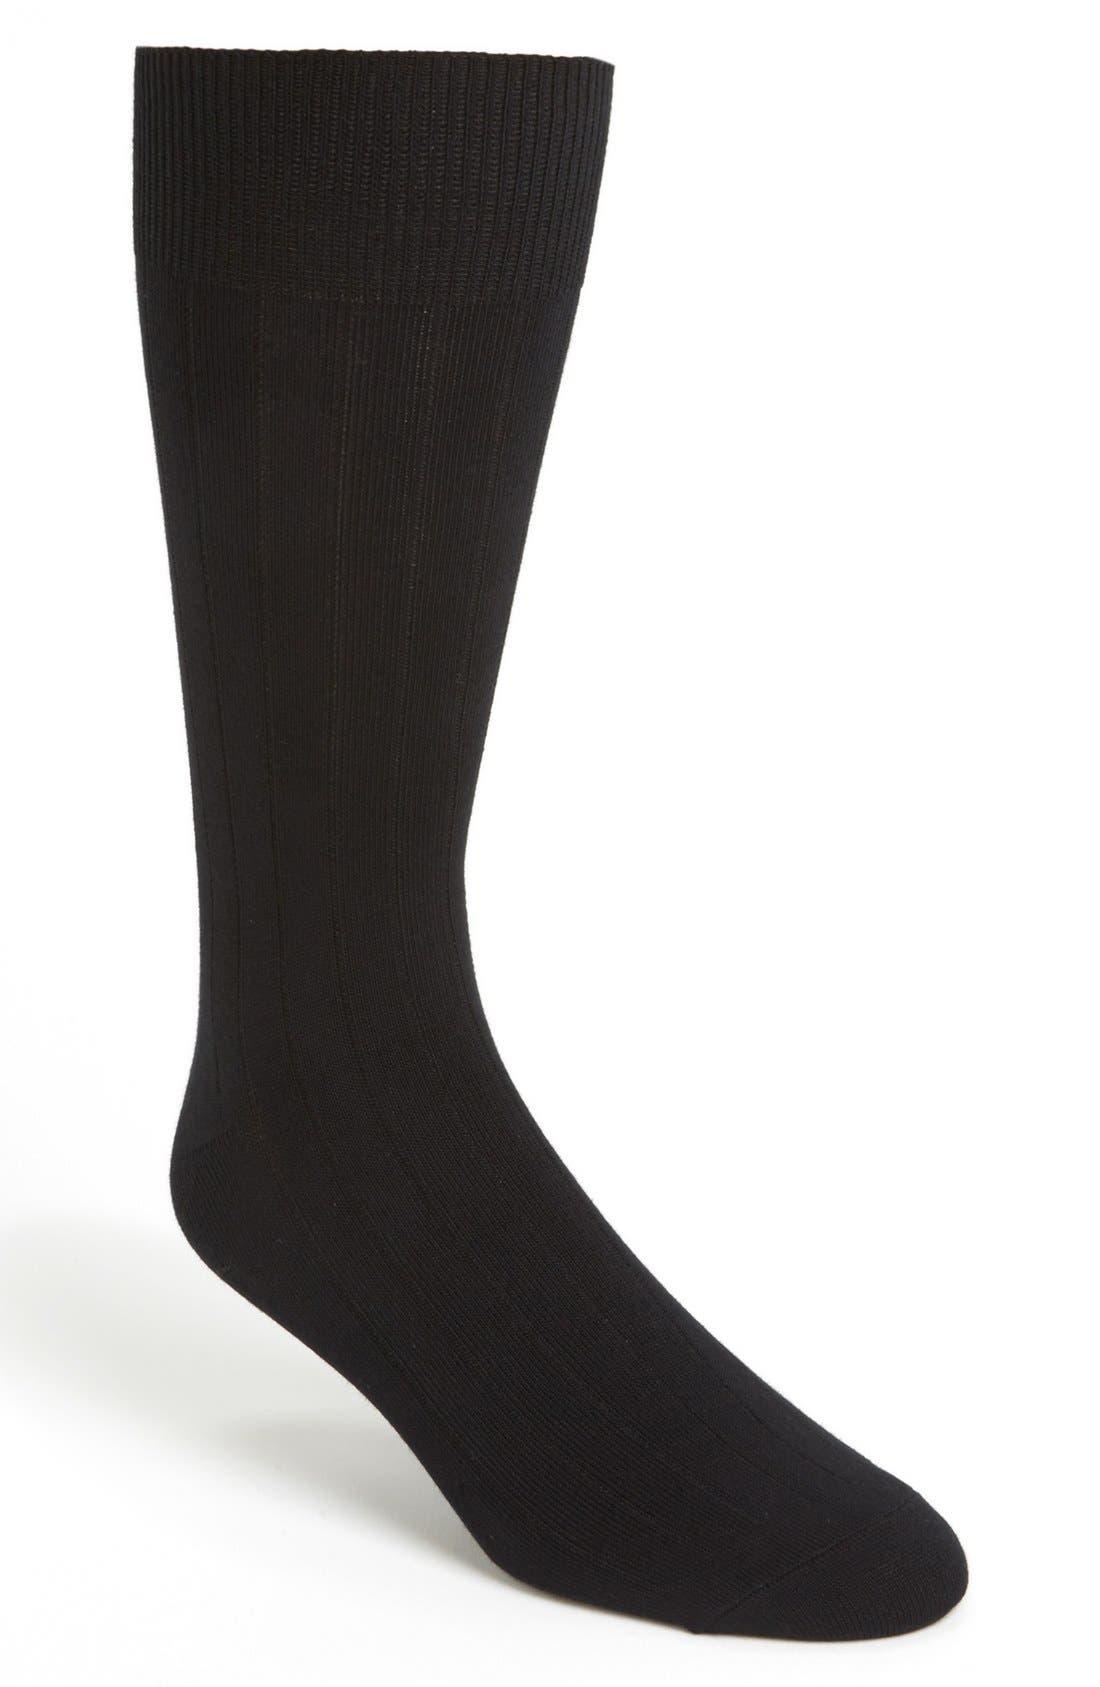 Main Image - Cole Haan Pima Cotton Blend Socks (3-Pack)